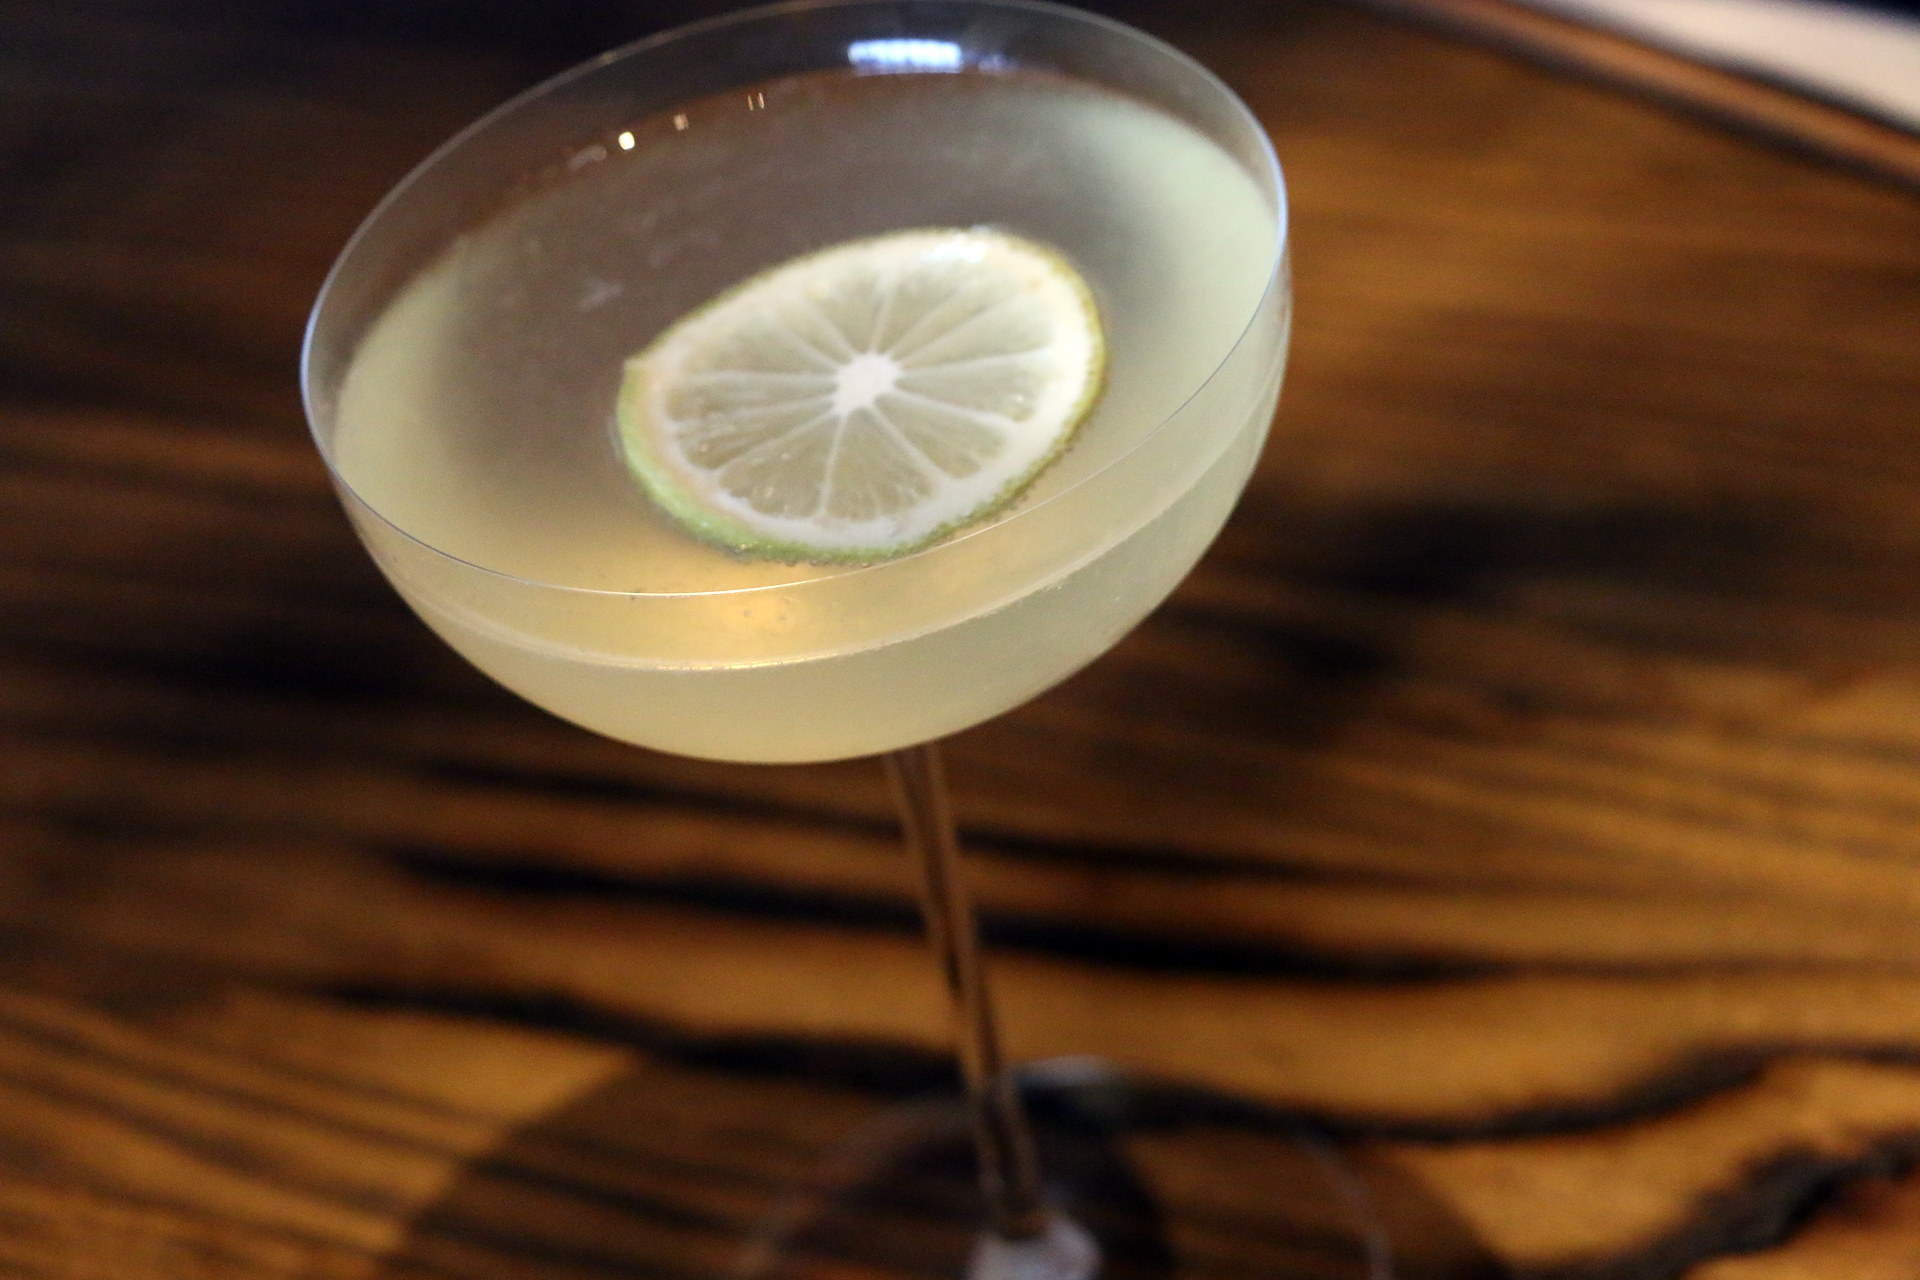 The Spanish Mistress cocktail